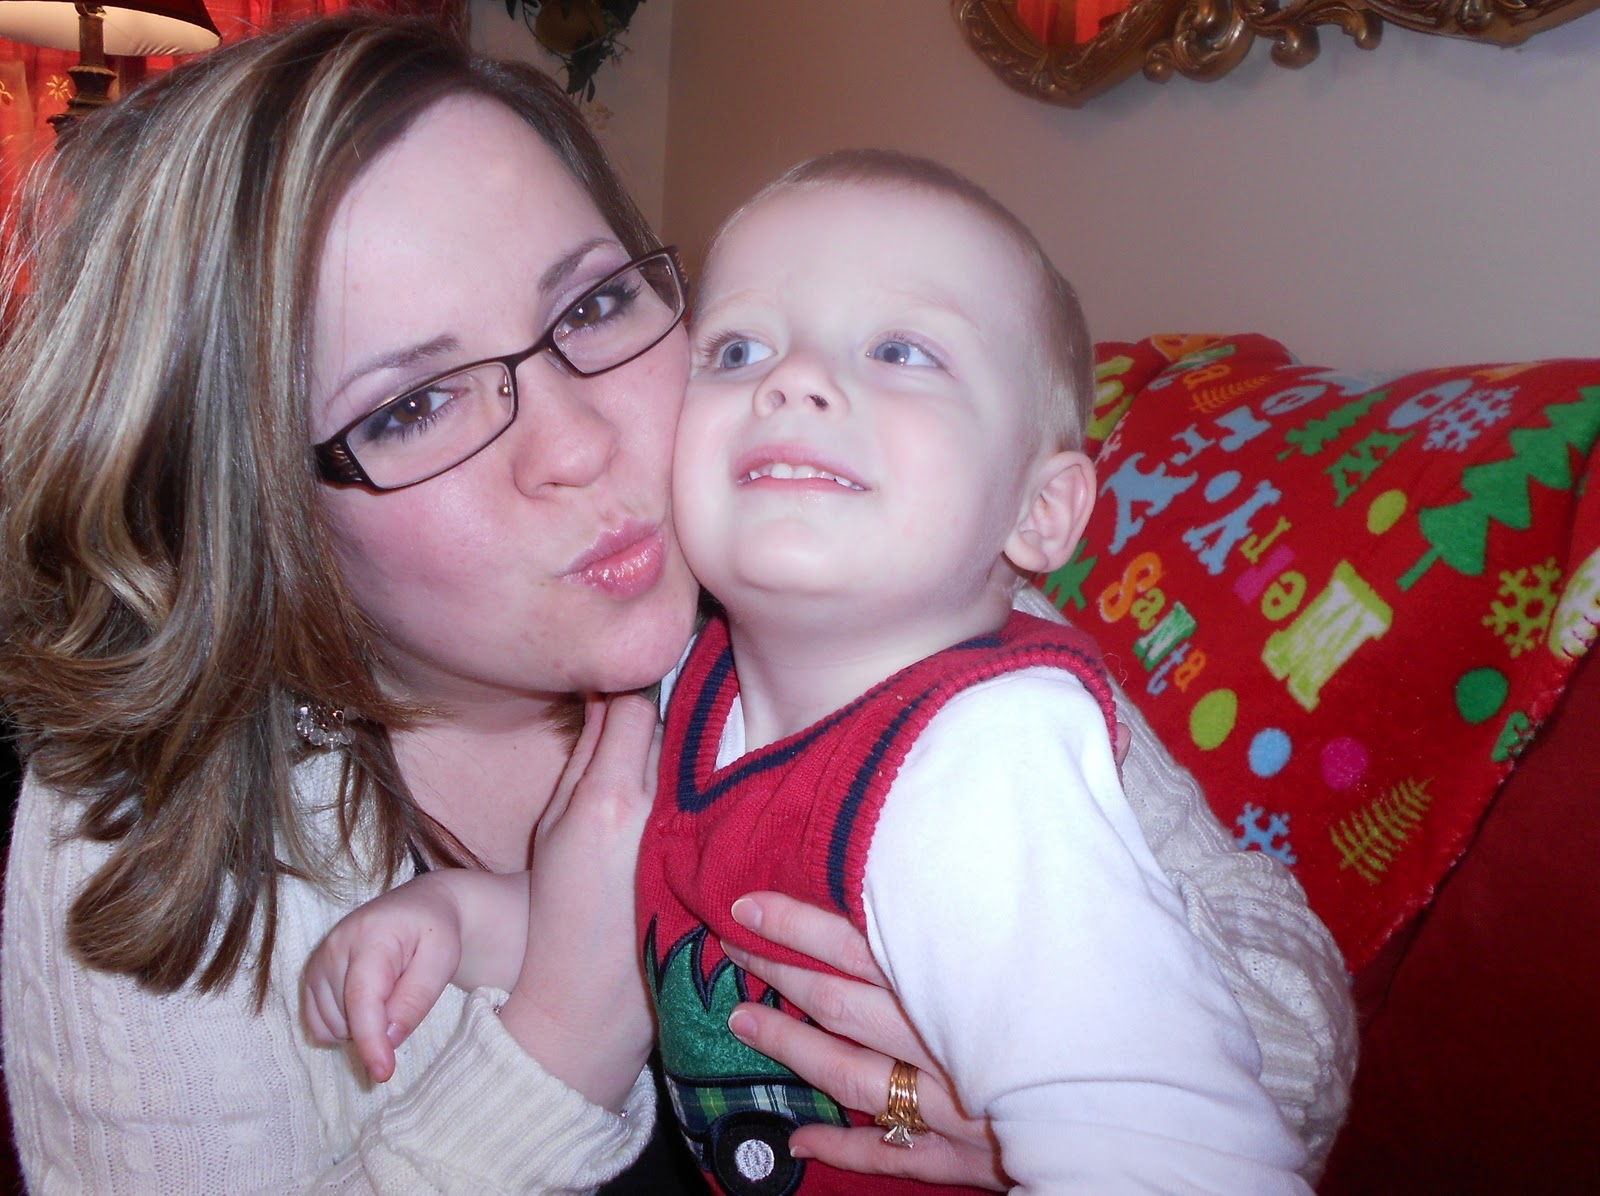 http://1.bp.blogspot.com/-j10y0HbVz-c/Tvf19fWHNvI/AAAAAAAAEPY/KBZR9sciJfo/s1600/Christmas+2011+056.JPG